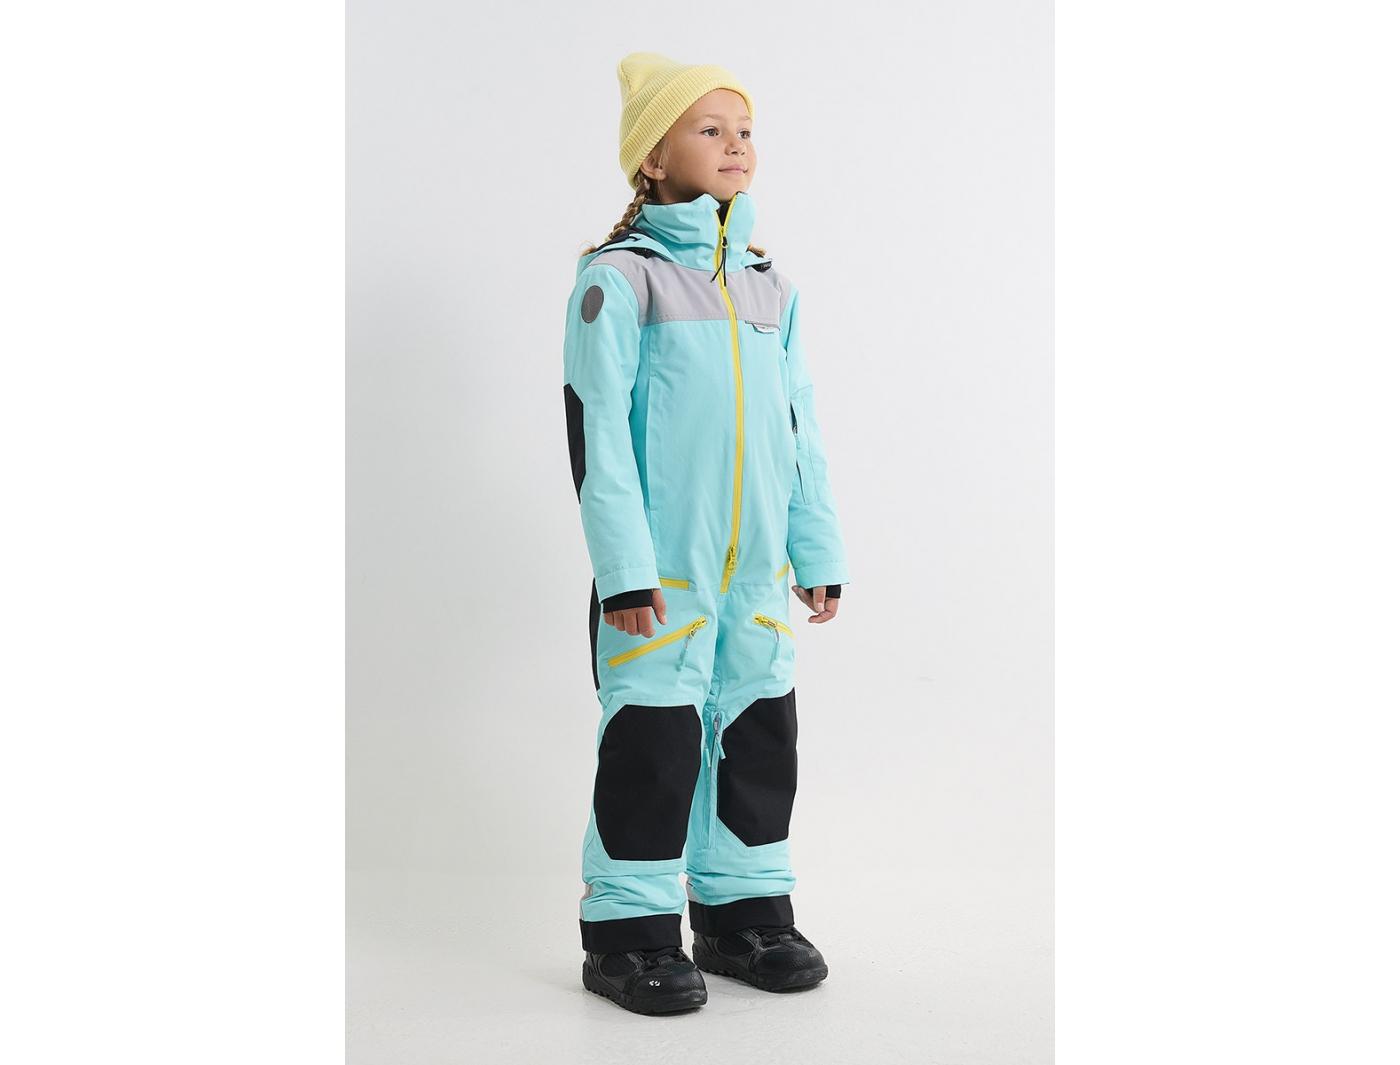 Комбинезон BOOST KN3128/23/36/23 аквамарин/холодный серый/аквамарин (2022)